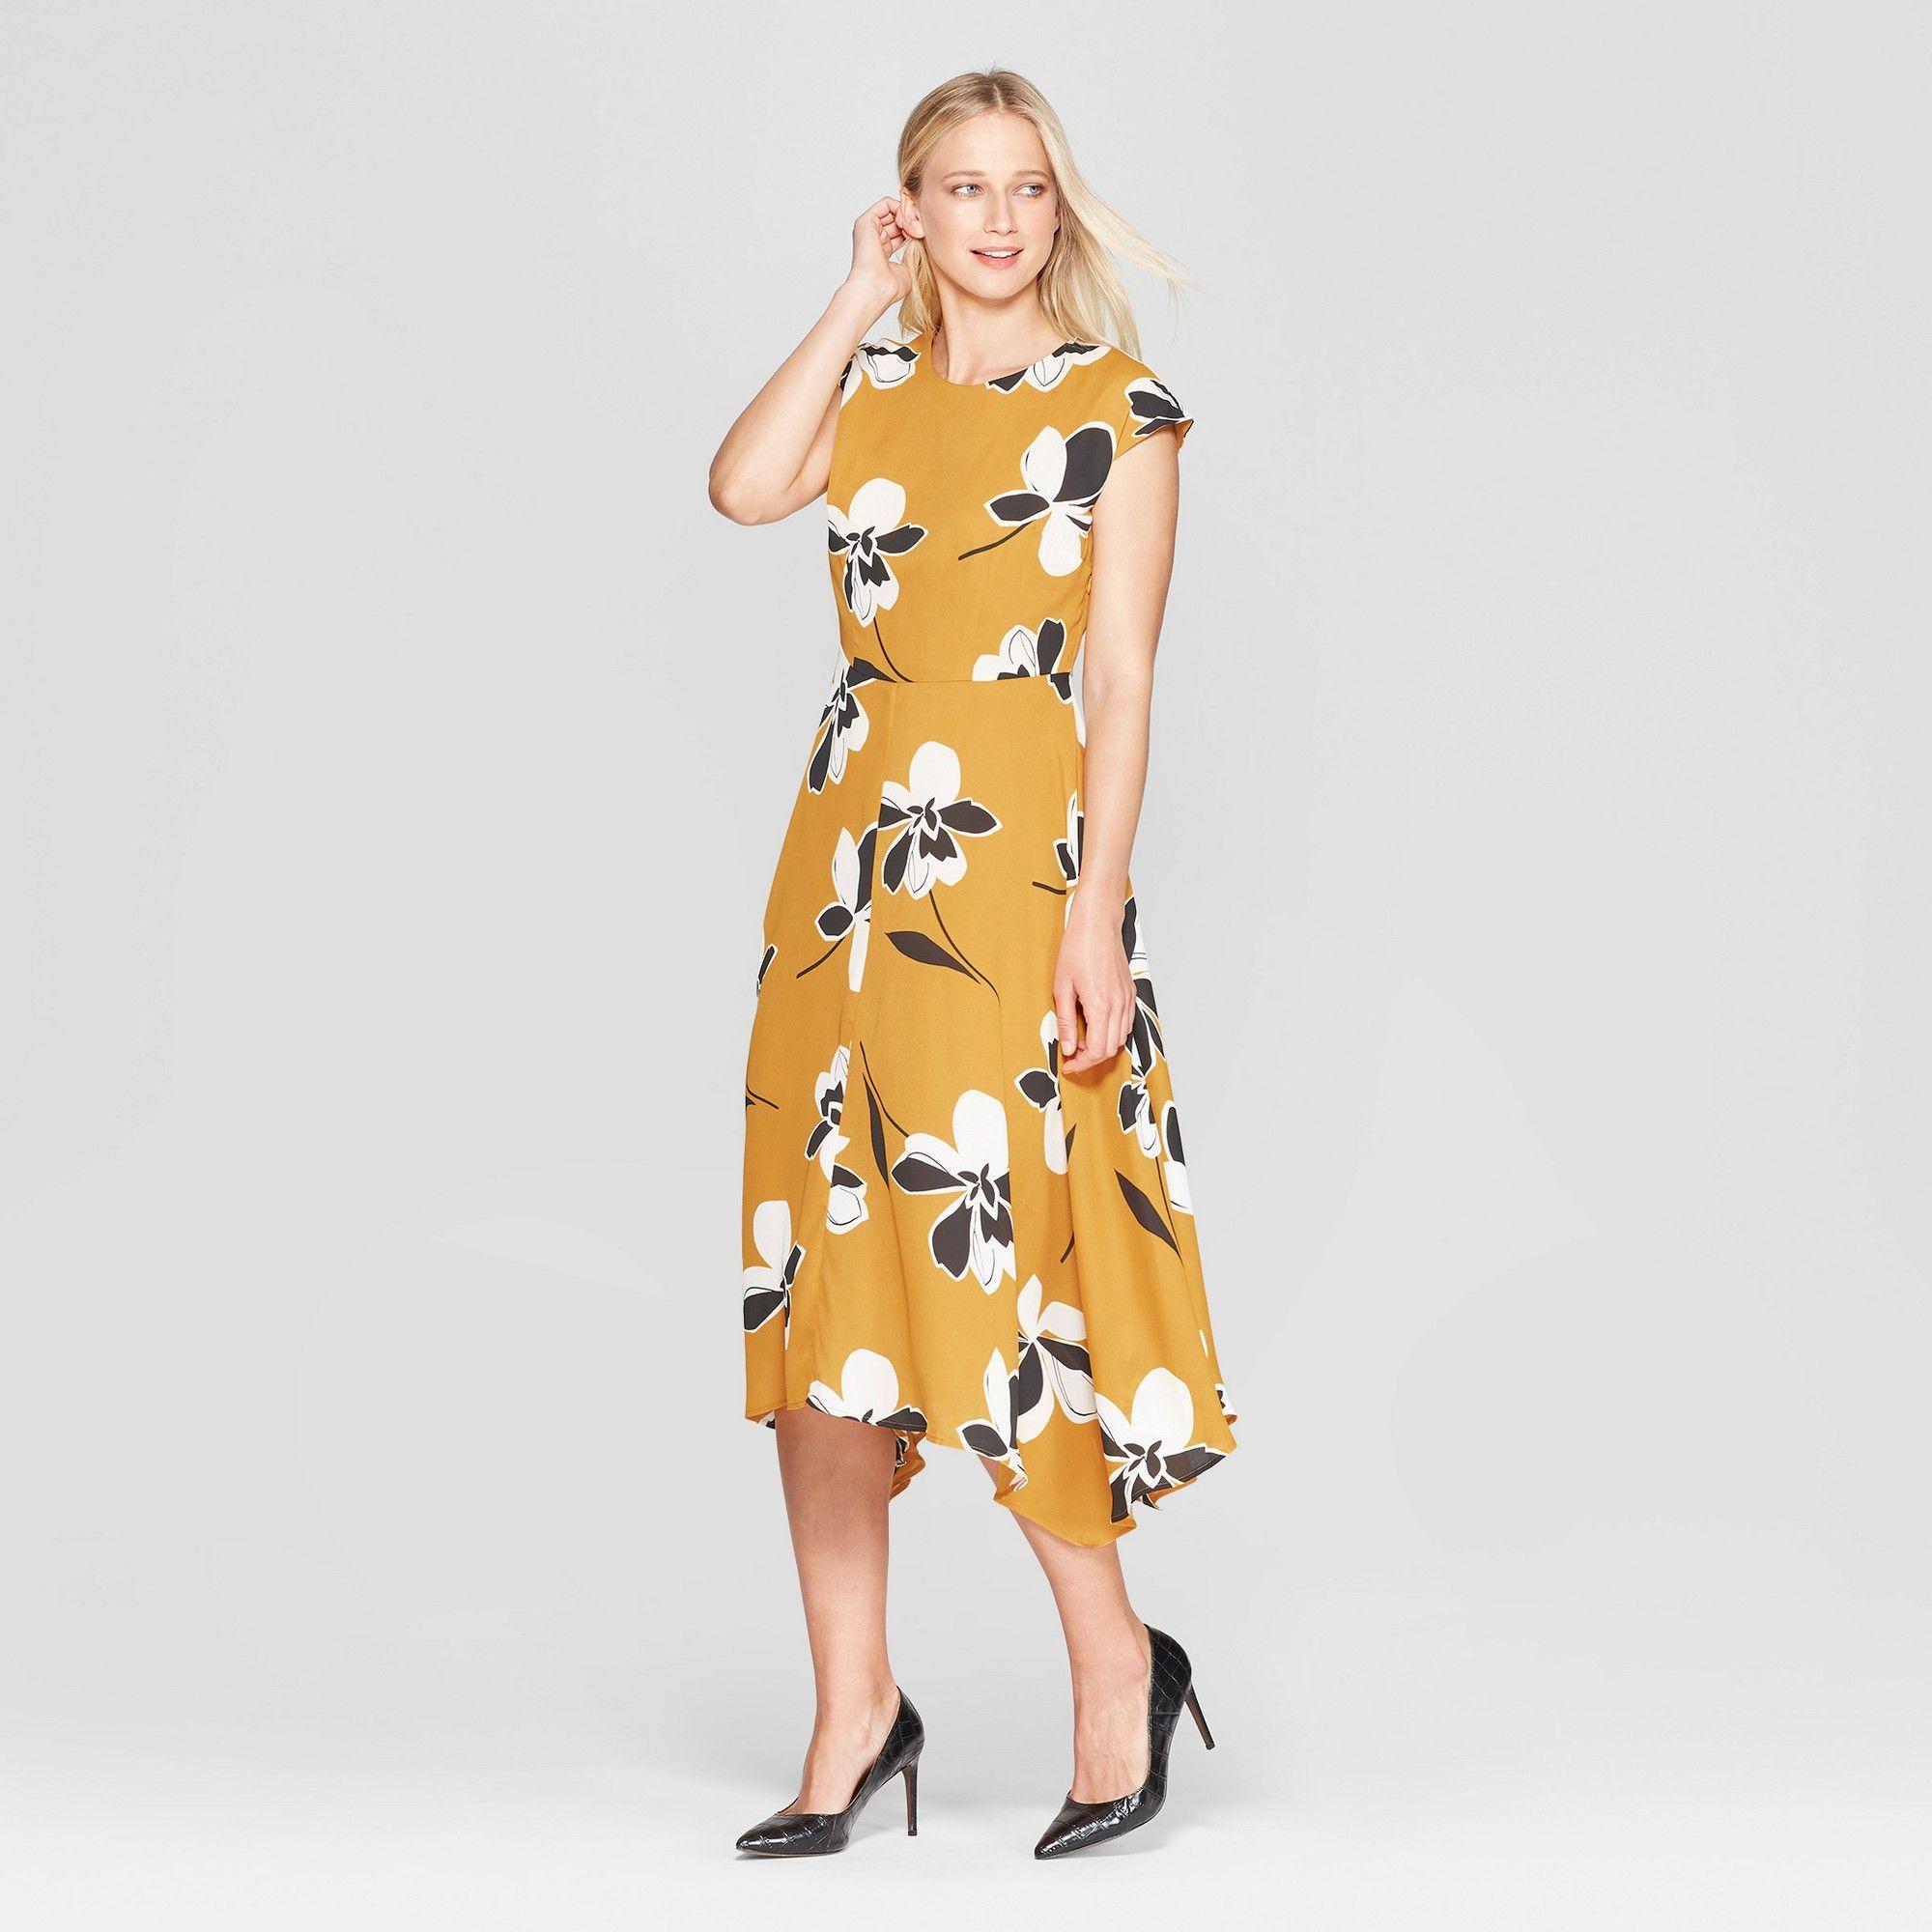 Women S Floral Print Cap Sleeve Asymmetric Hem Midi Dress Who What Wear Yellow M Target Dresses Midi Dress Who What Wear [ 2000 x 2000 Pixel ]